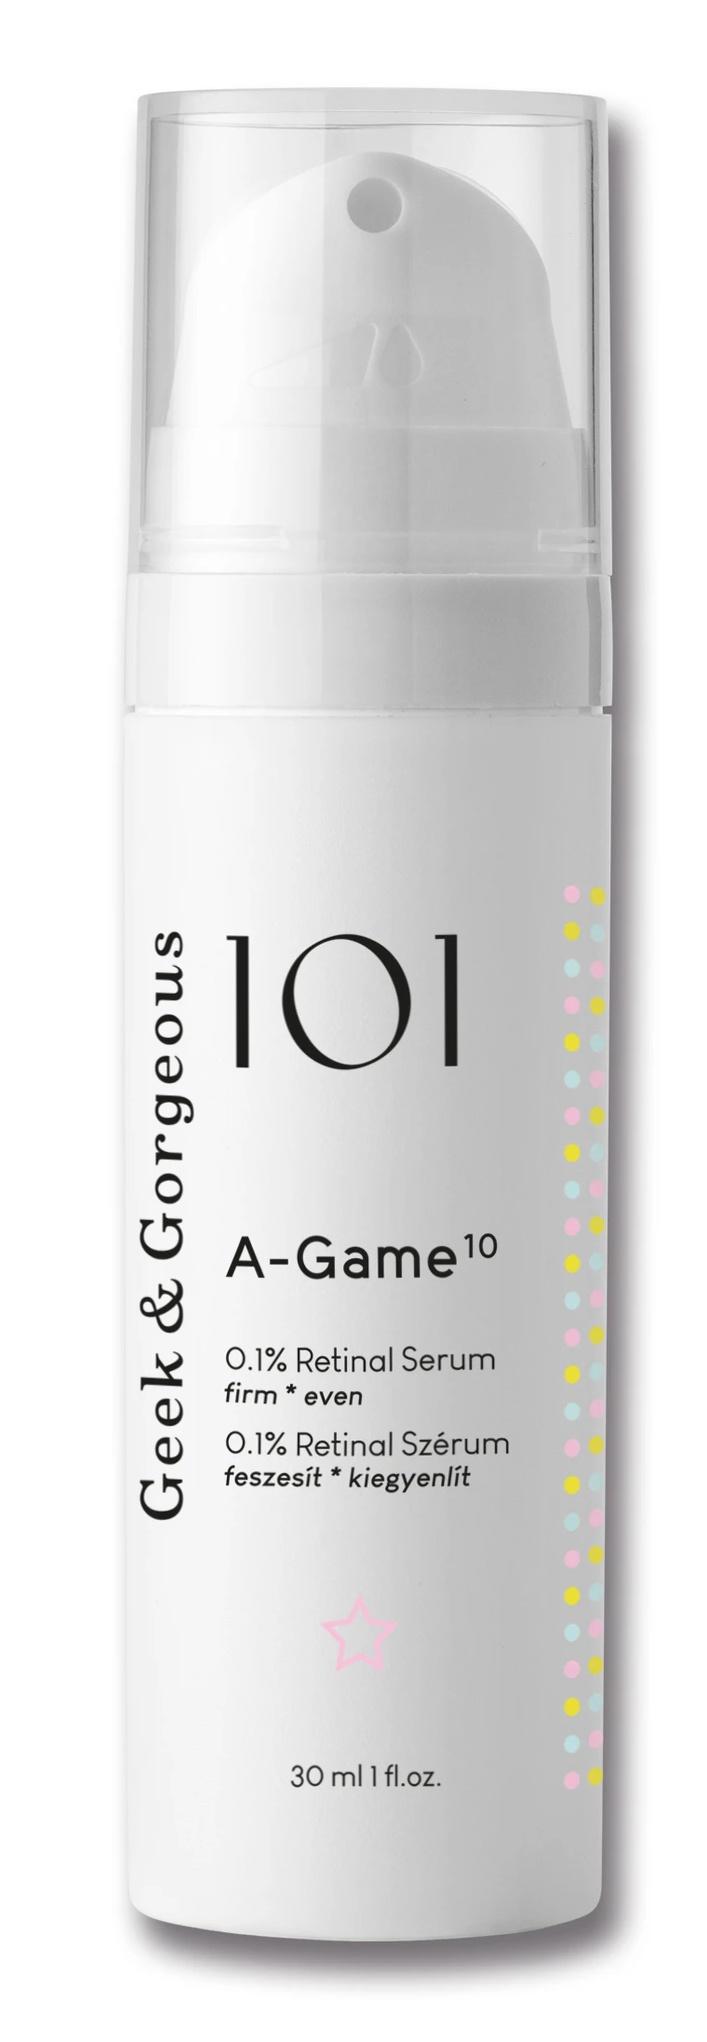 Geek & Gorgeous 101 A-Game 10 0.1% Retinal Serum